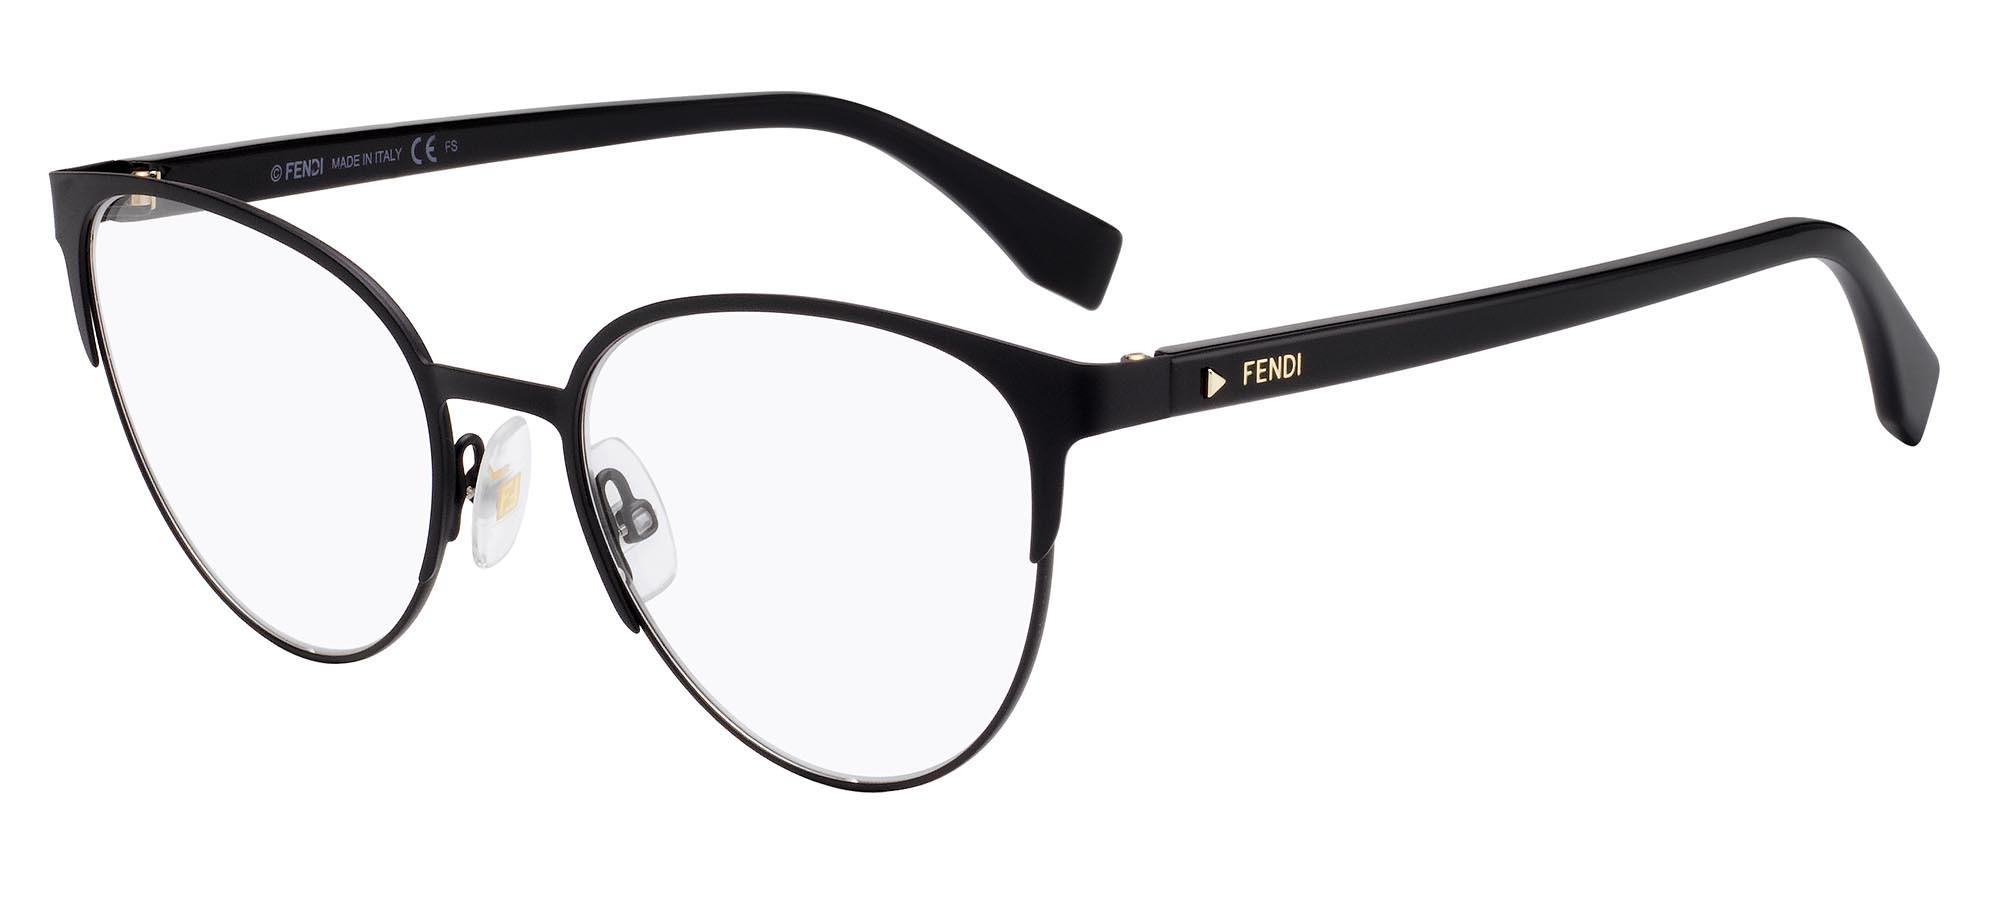 Fendi eyeglasses ROMA FF 0320